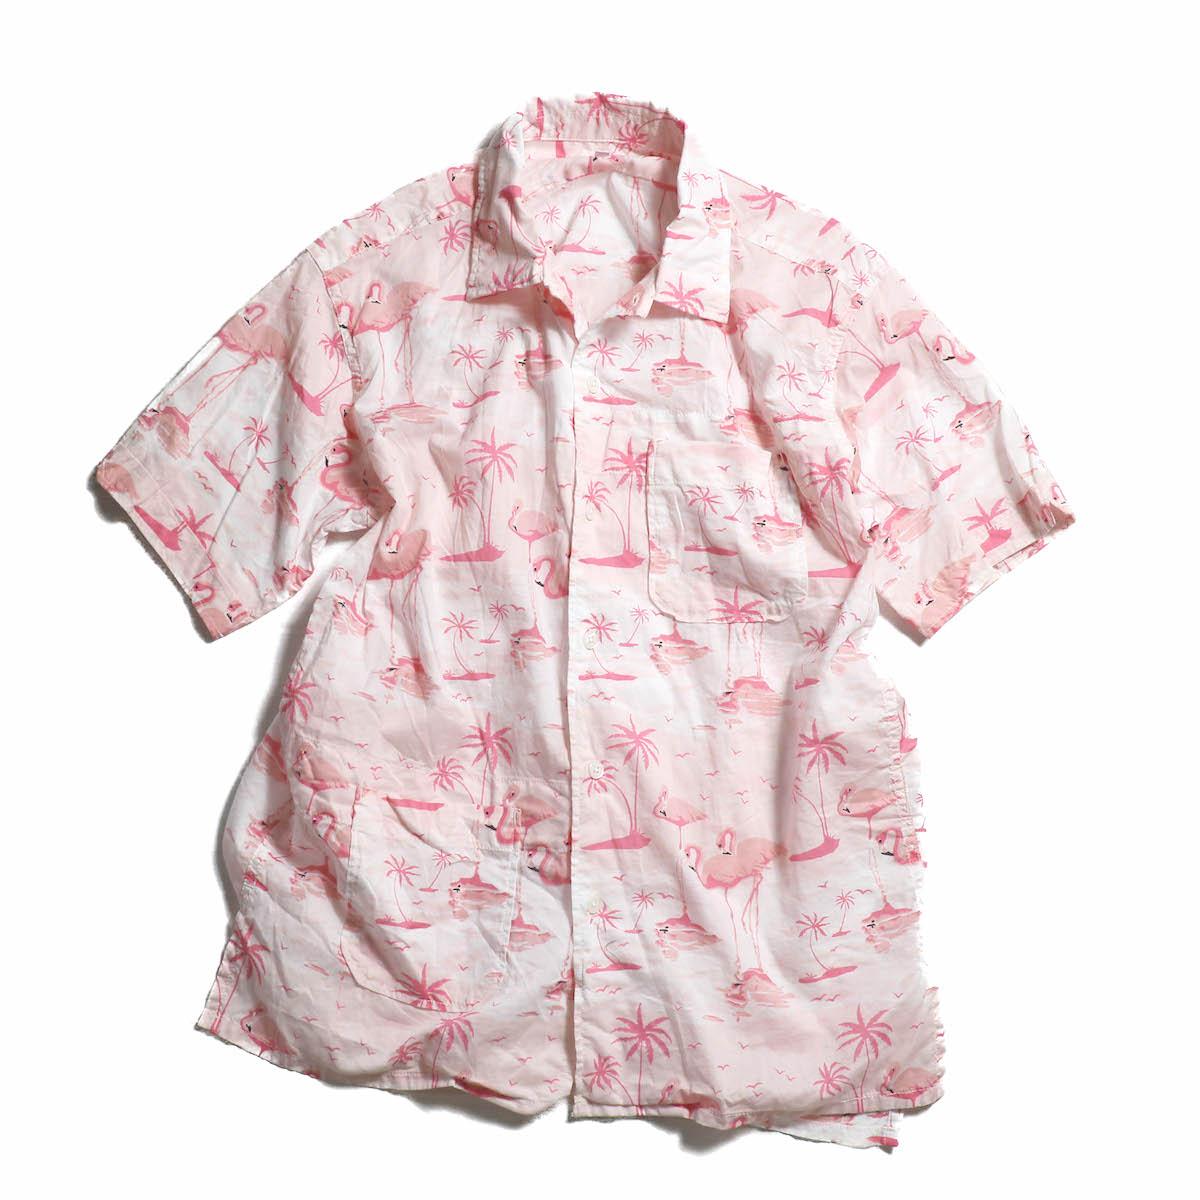 ENGINEERED GARMENTS / Camp Shirt - Flamingo Print